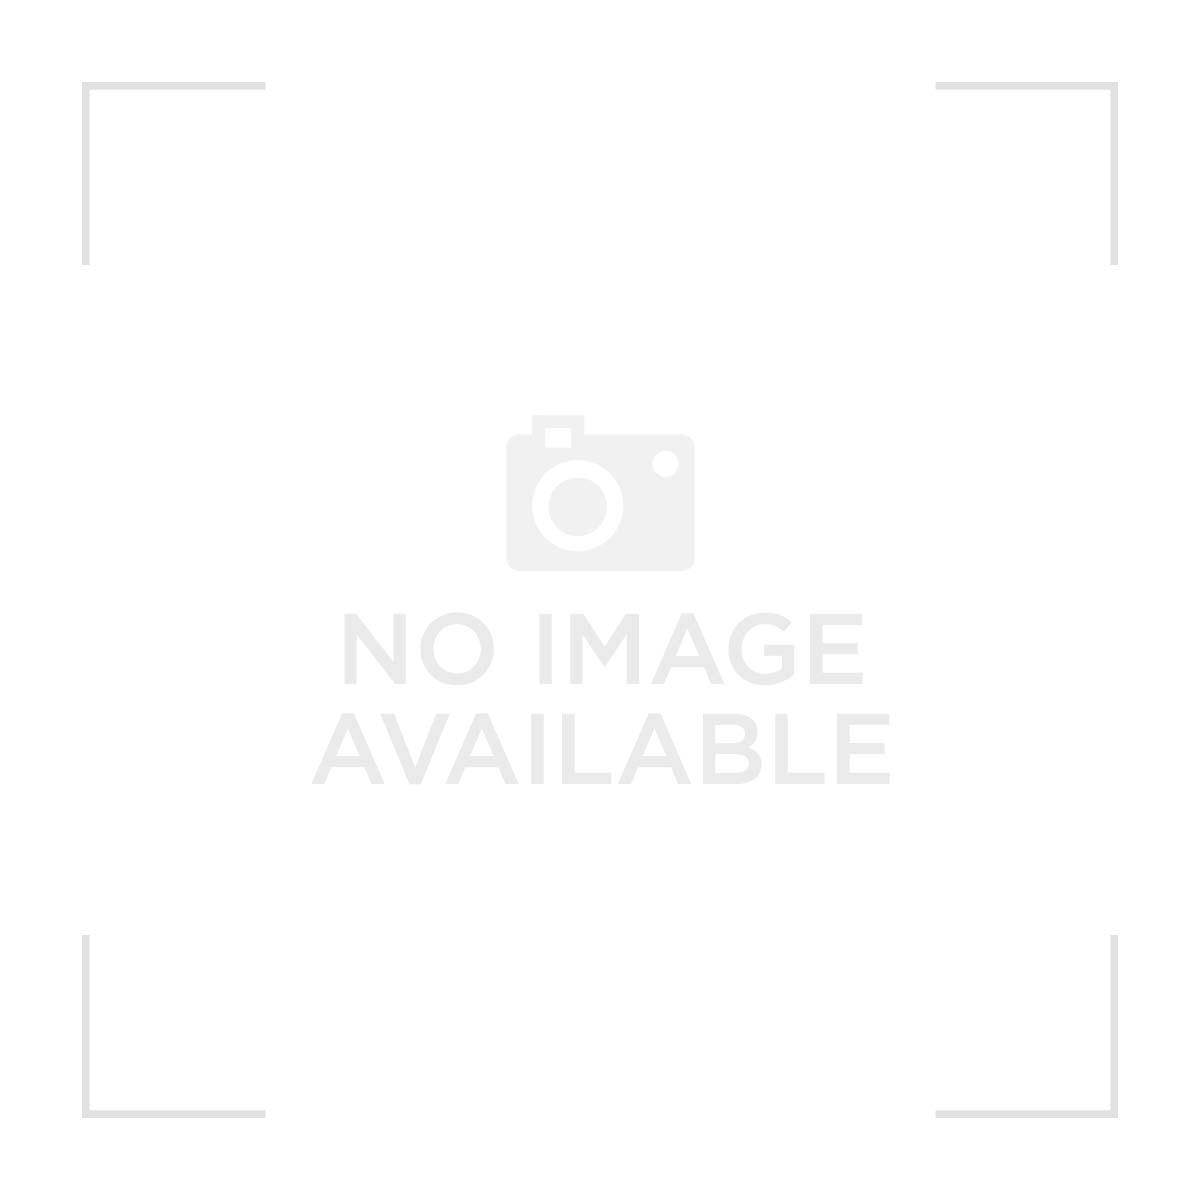 Bistro Blends 18 Year Heirloom Balsamic Vinegar 12.7 OZ